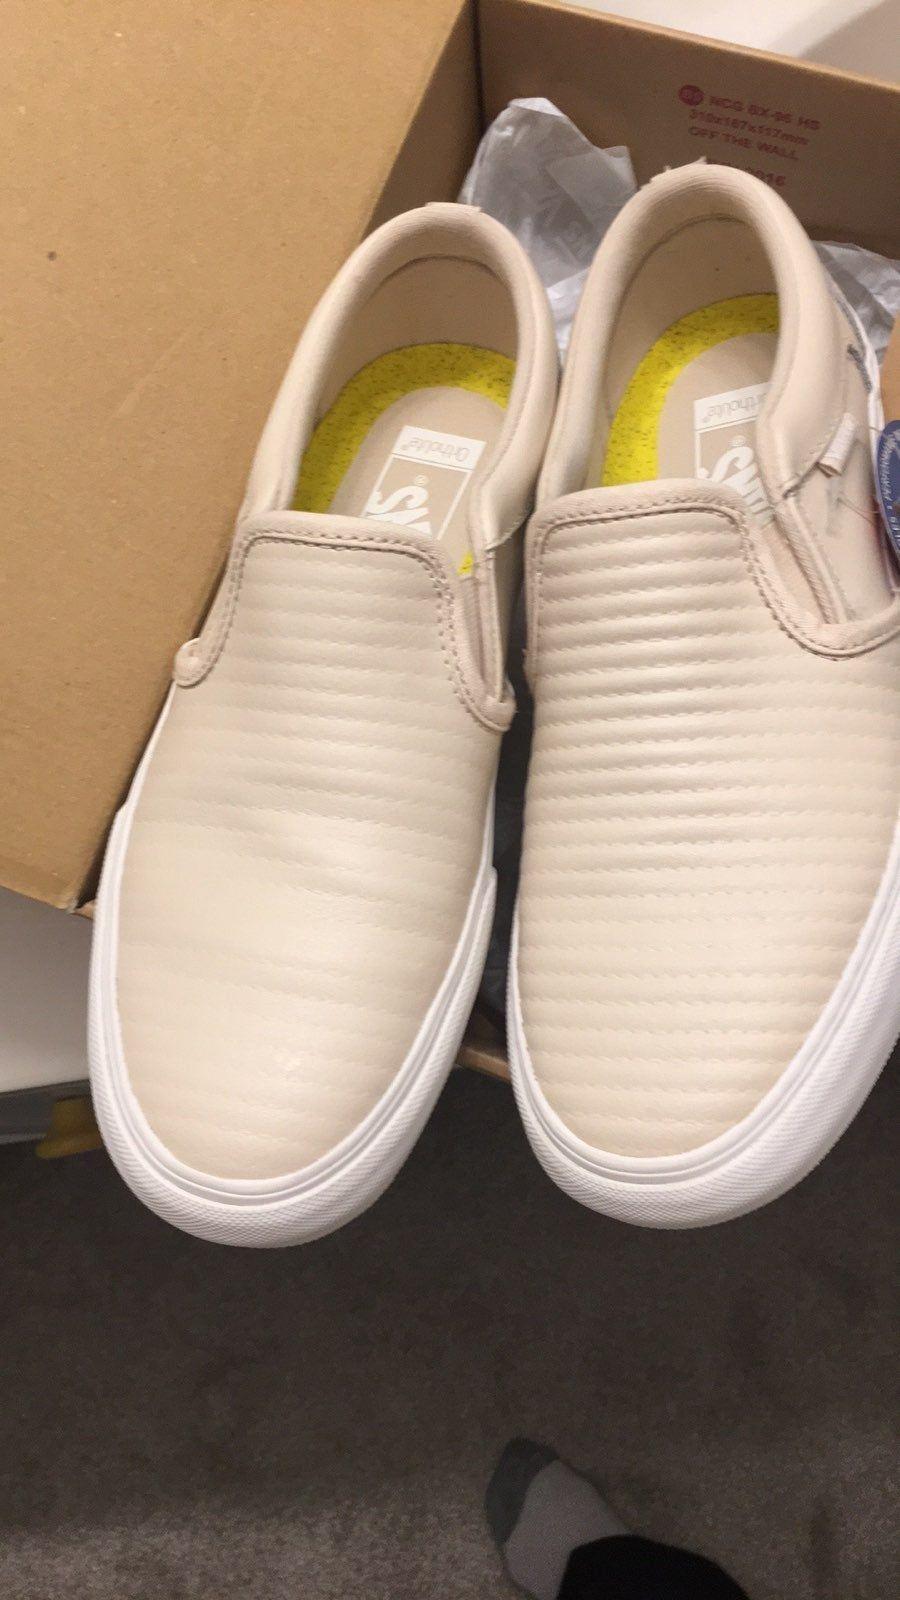 Vans ortholite slip On sneakers cream